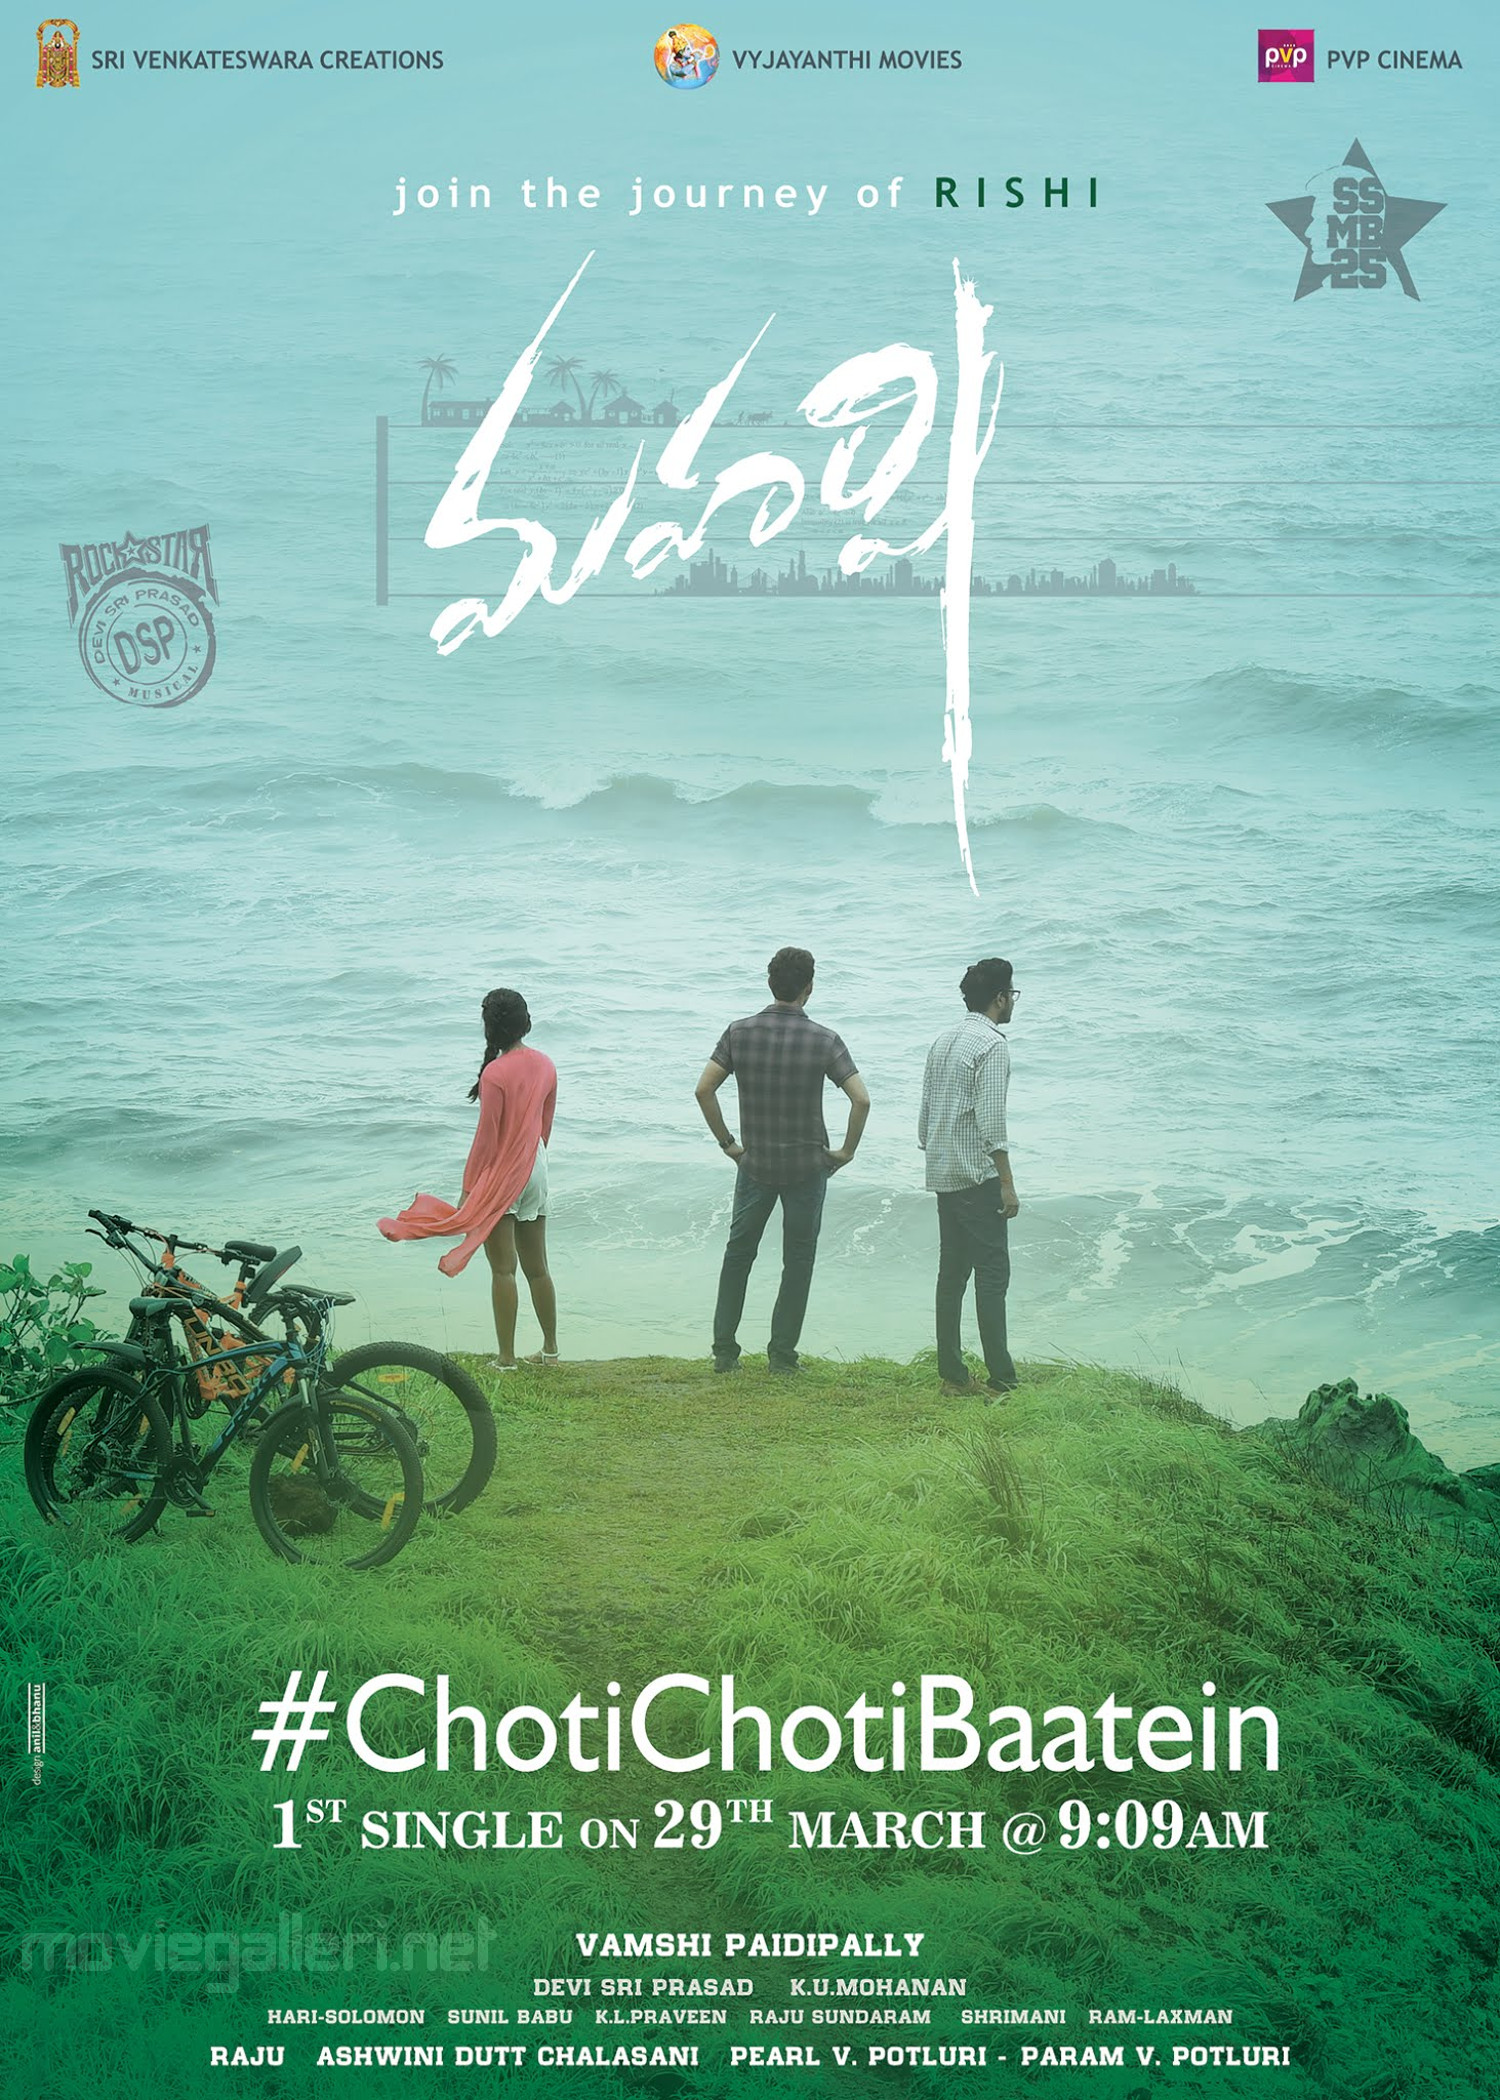 Maharshi Movie First Single Choti Choti Baatein Song Release Posters